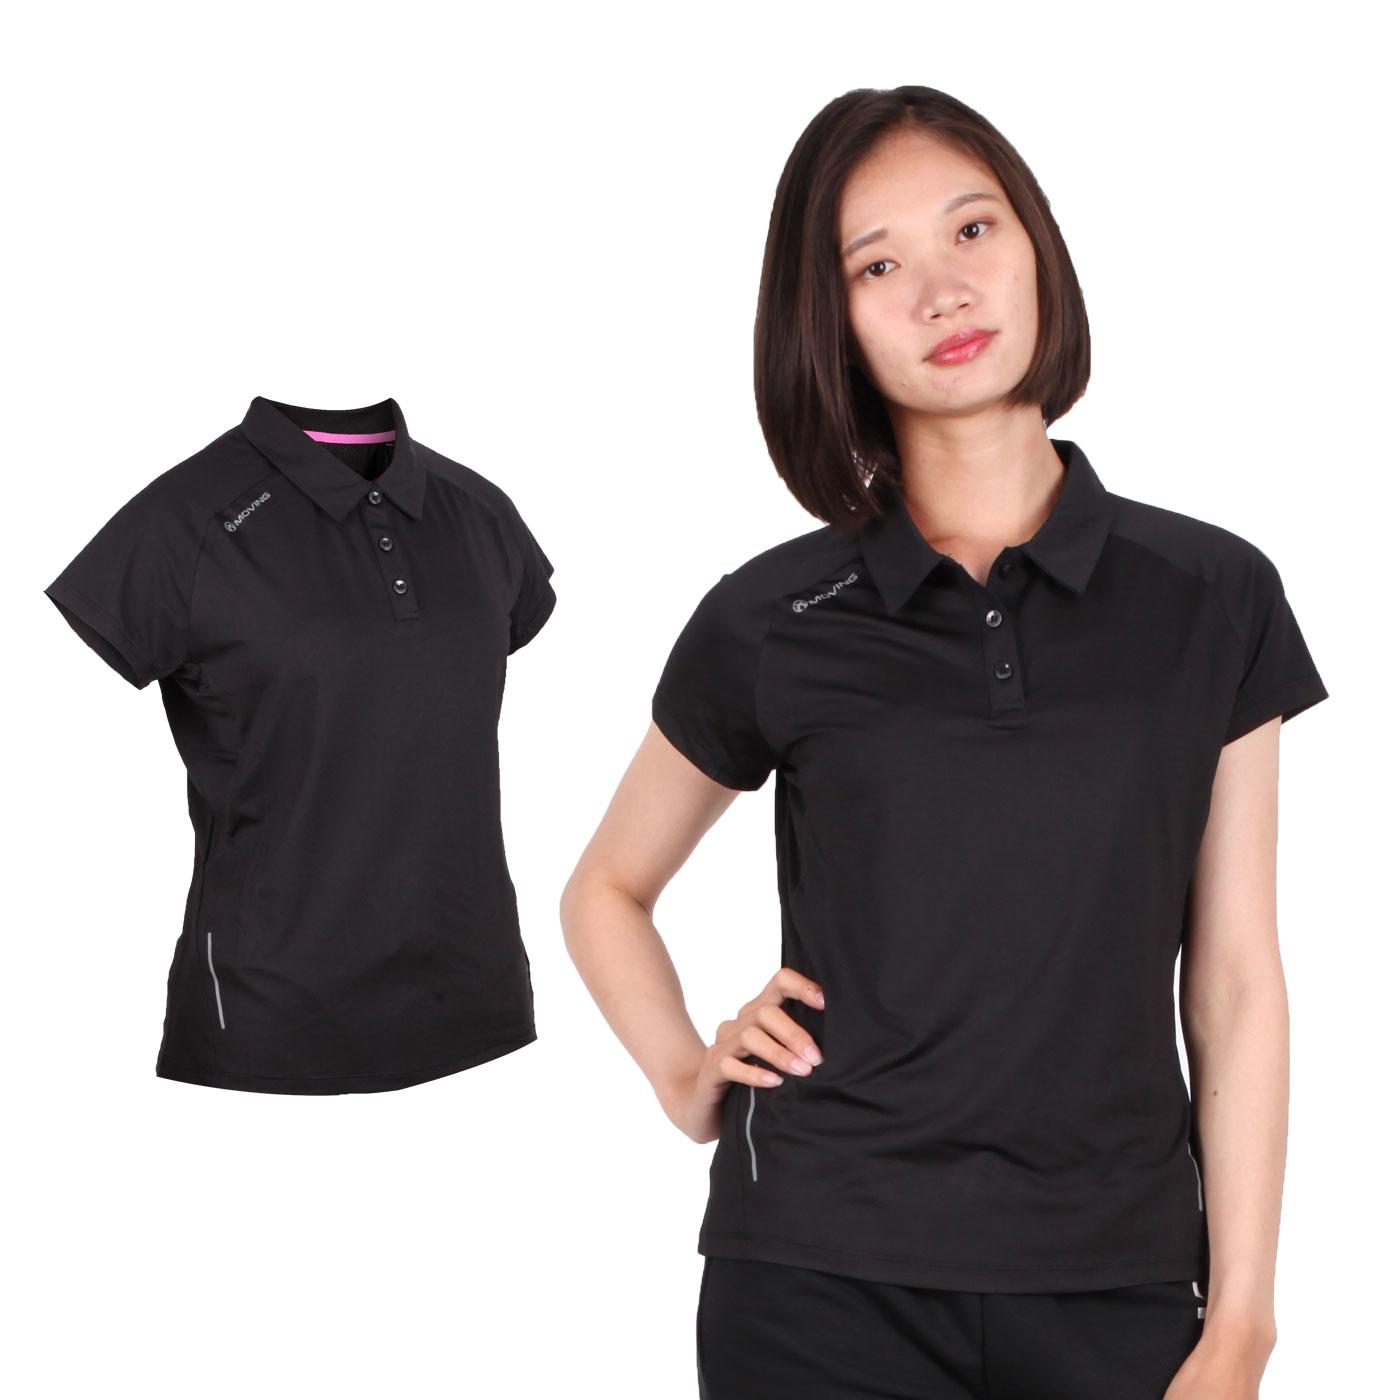 FIRESTAR 女款彈性短袖POLO衫 DL968-10